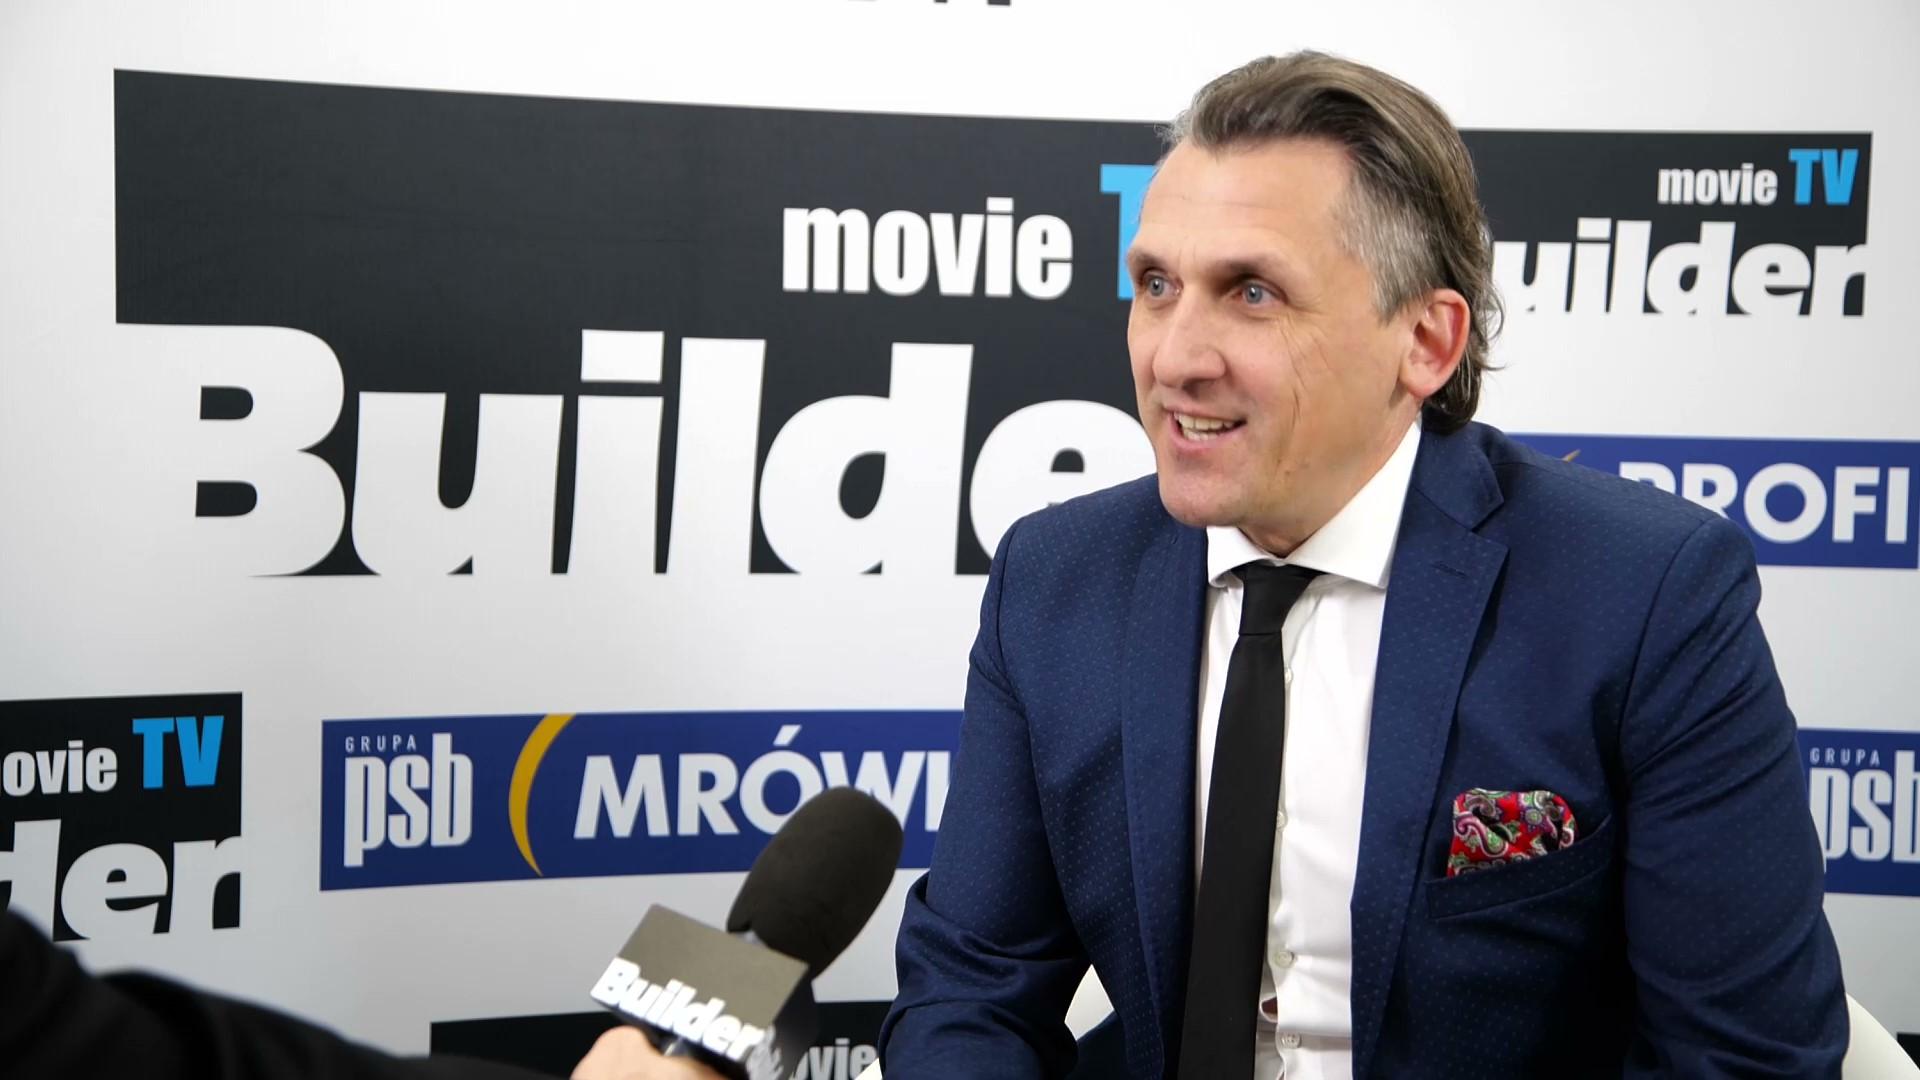 TARGI PSB 2020 – ROBERT SZYBIAK, STEGU SP. Z O.O.